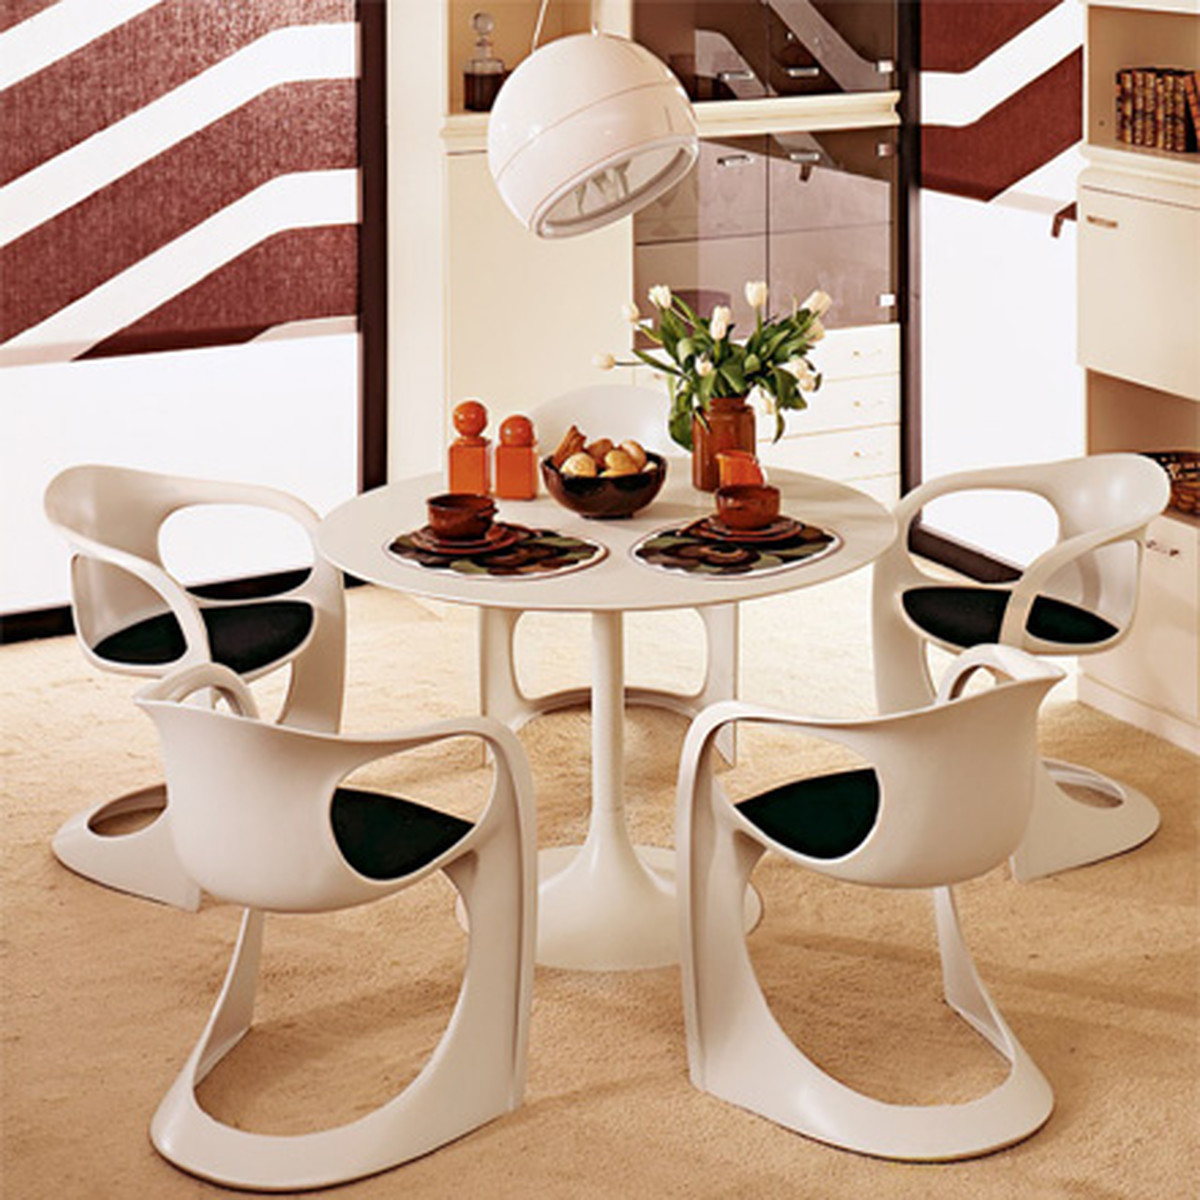 casalino 2008 10 armlehnstuhl von casala. Black Bedroom Furniture Sets. Home Design Ideas